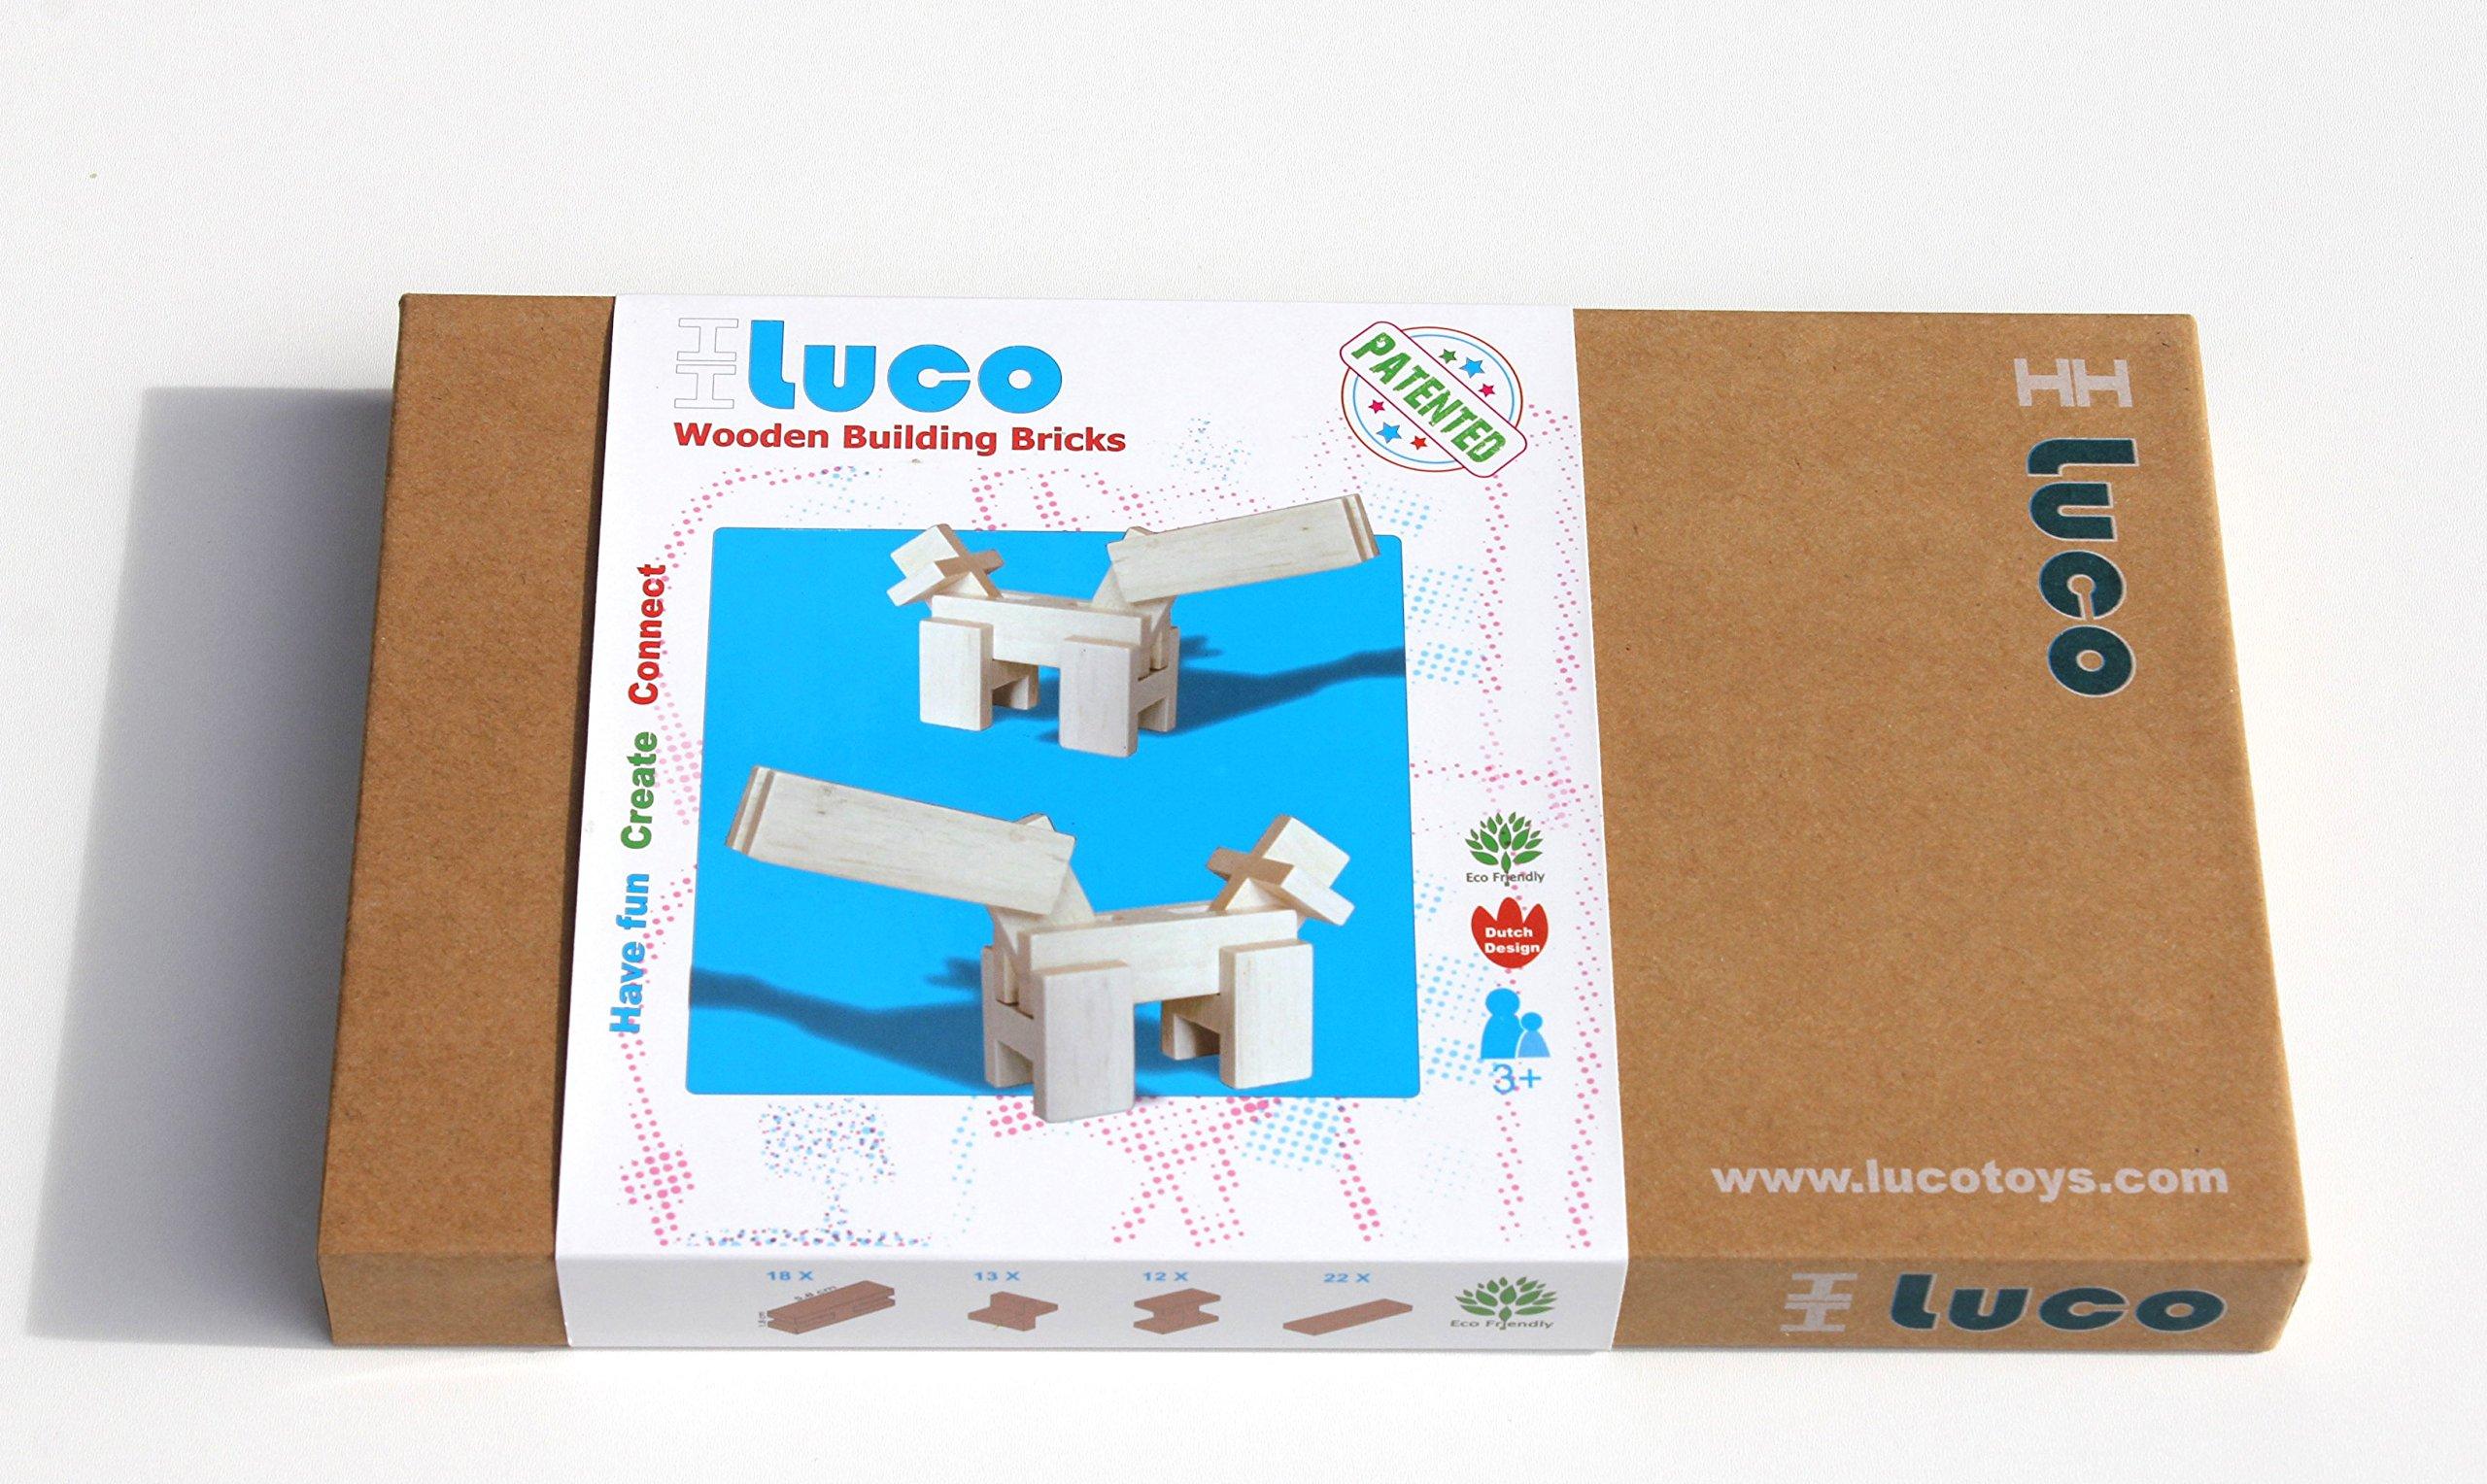 Luco Wooden Building Bricks/Blocks | Natural Wood | Eco-Friendly | Educationa.. 14